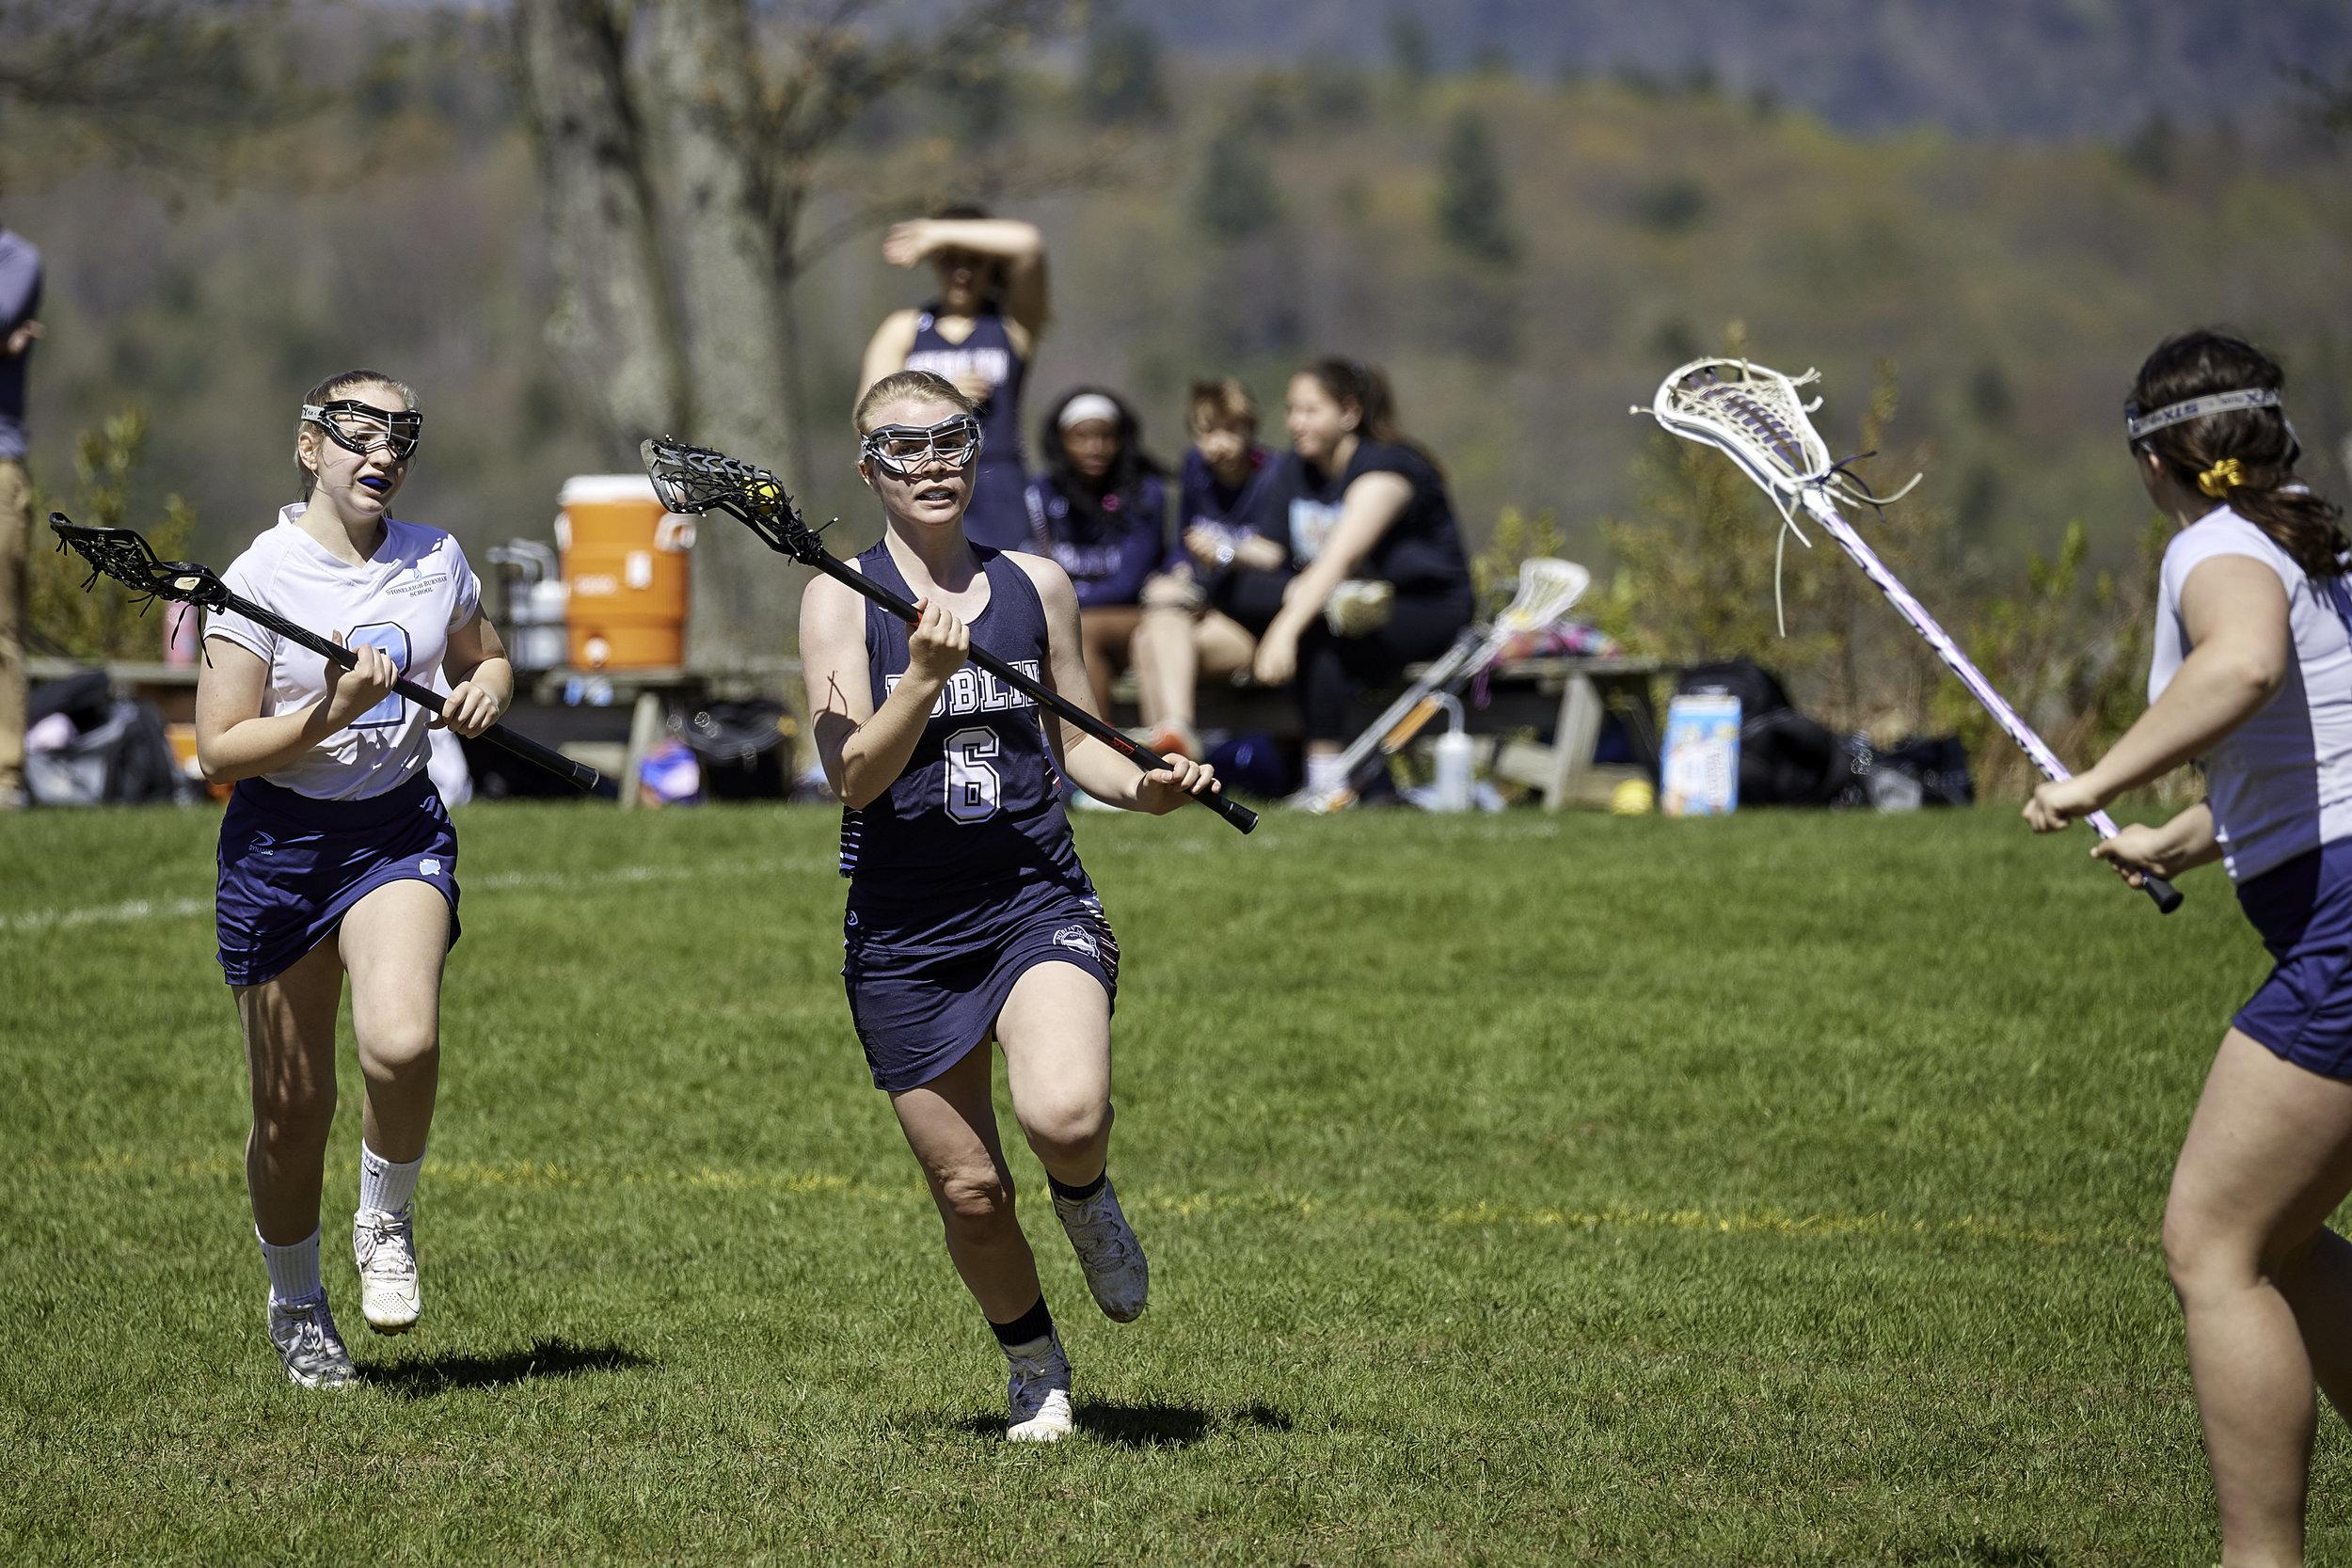 Girls Lacrosse vs. Stoneleigh Burnham School - May 11, 2019 - May 10, 2019193342.jpg